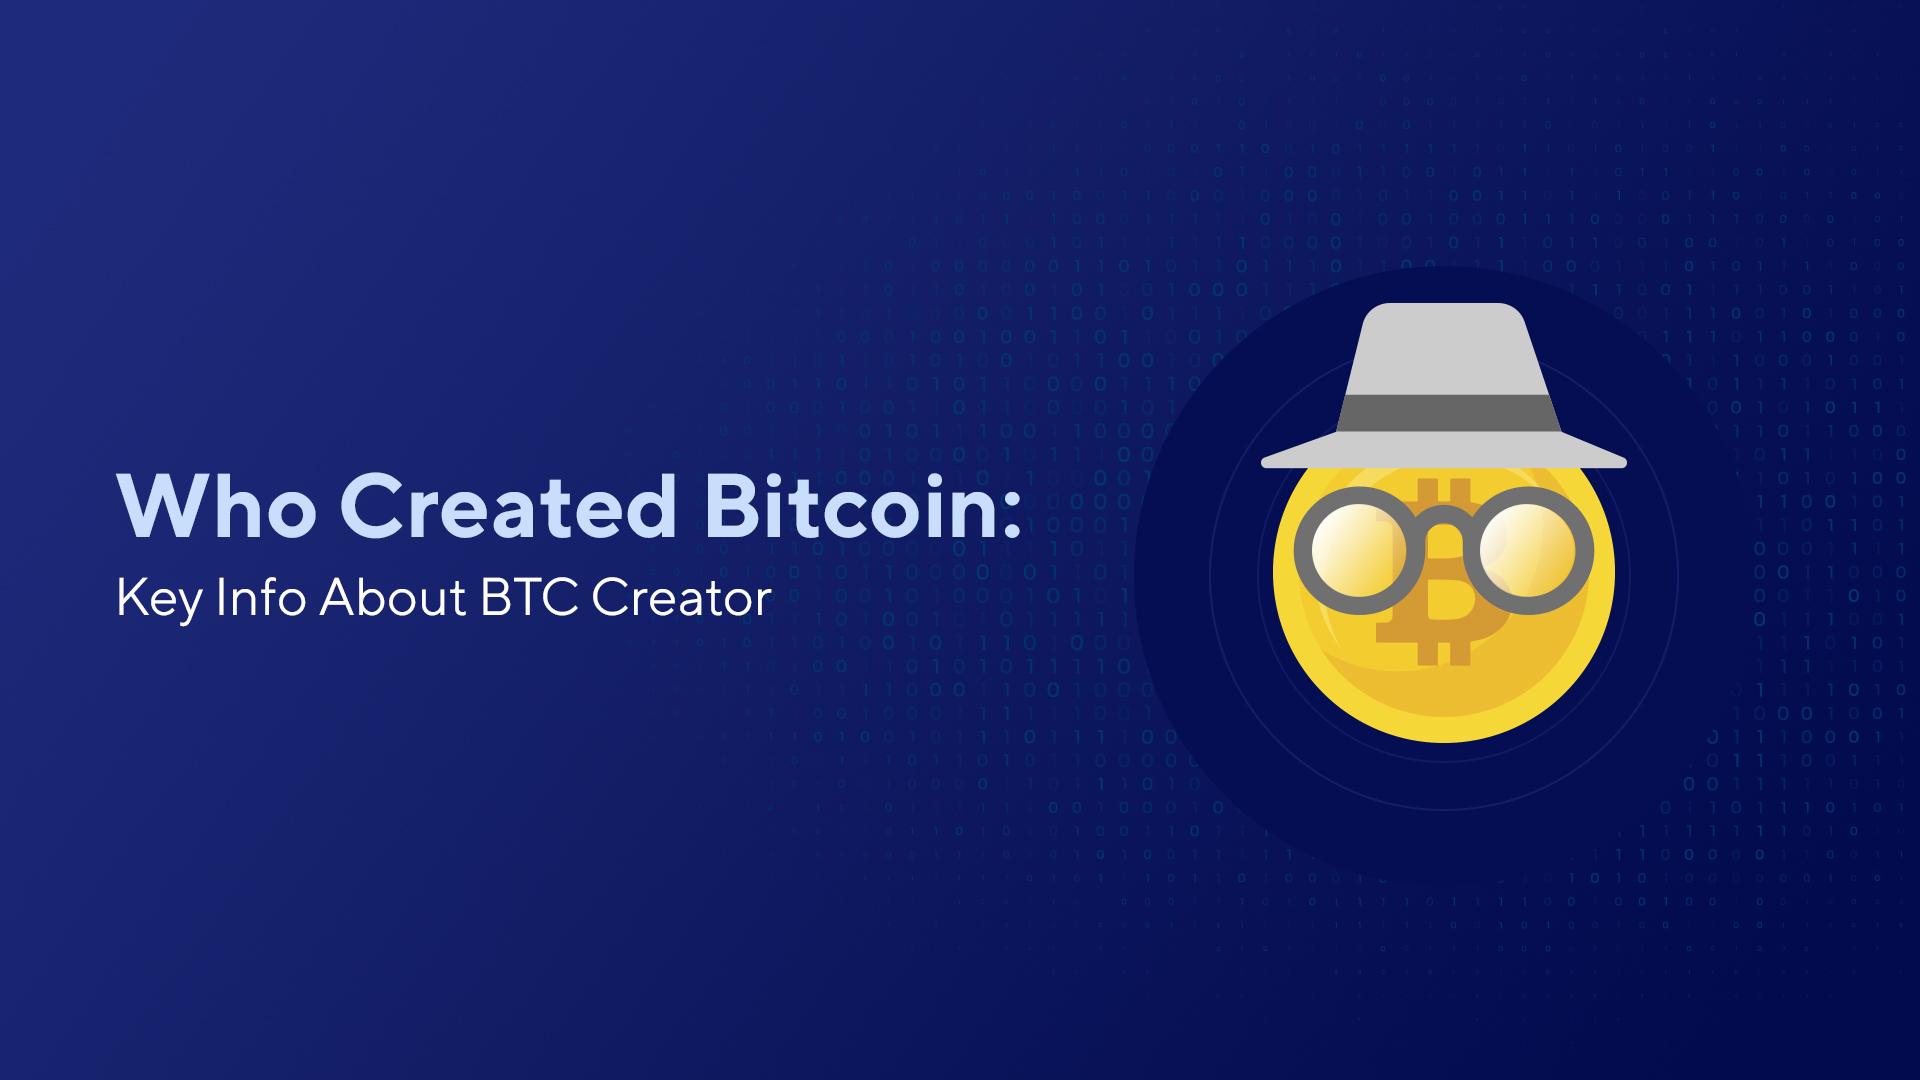 Who Created Bitcoin: Key Info About BTC Creator